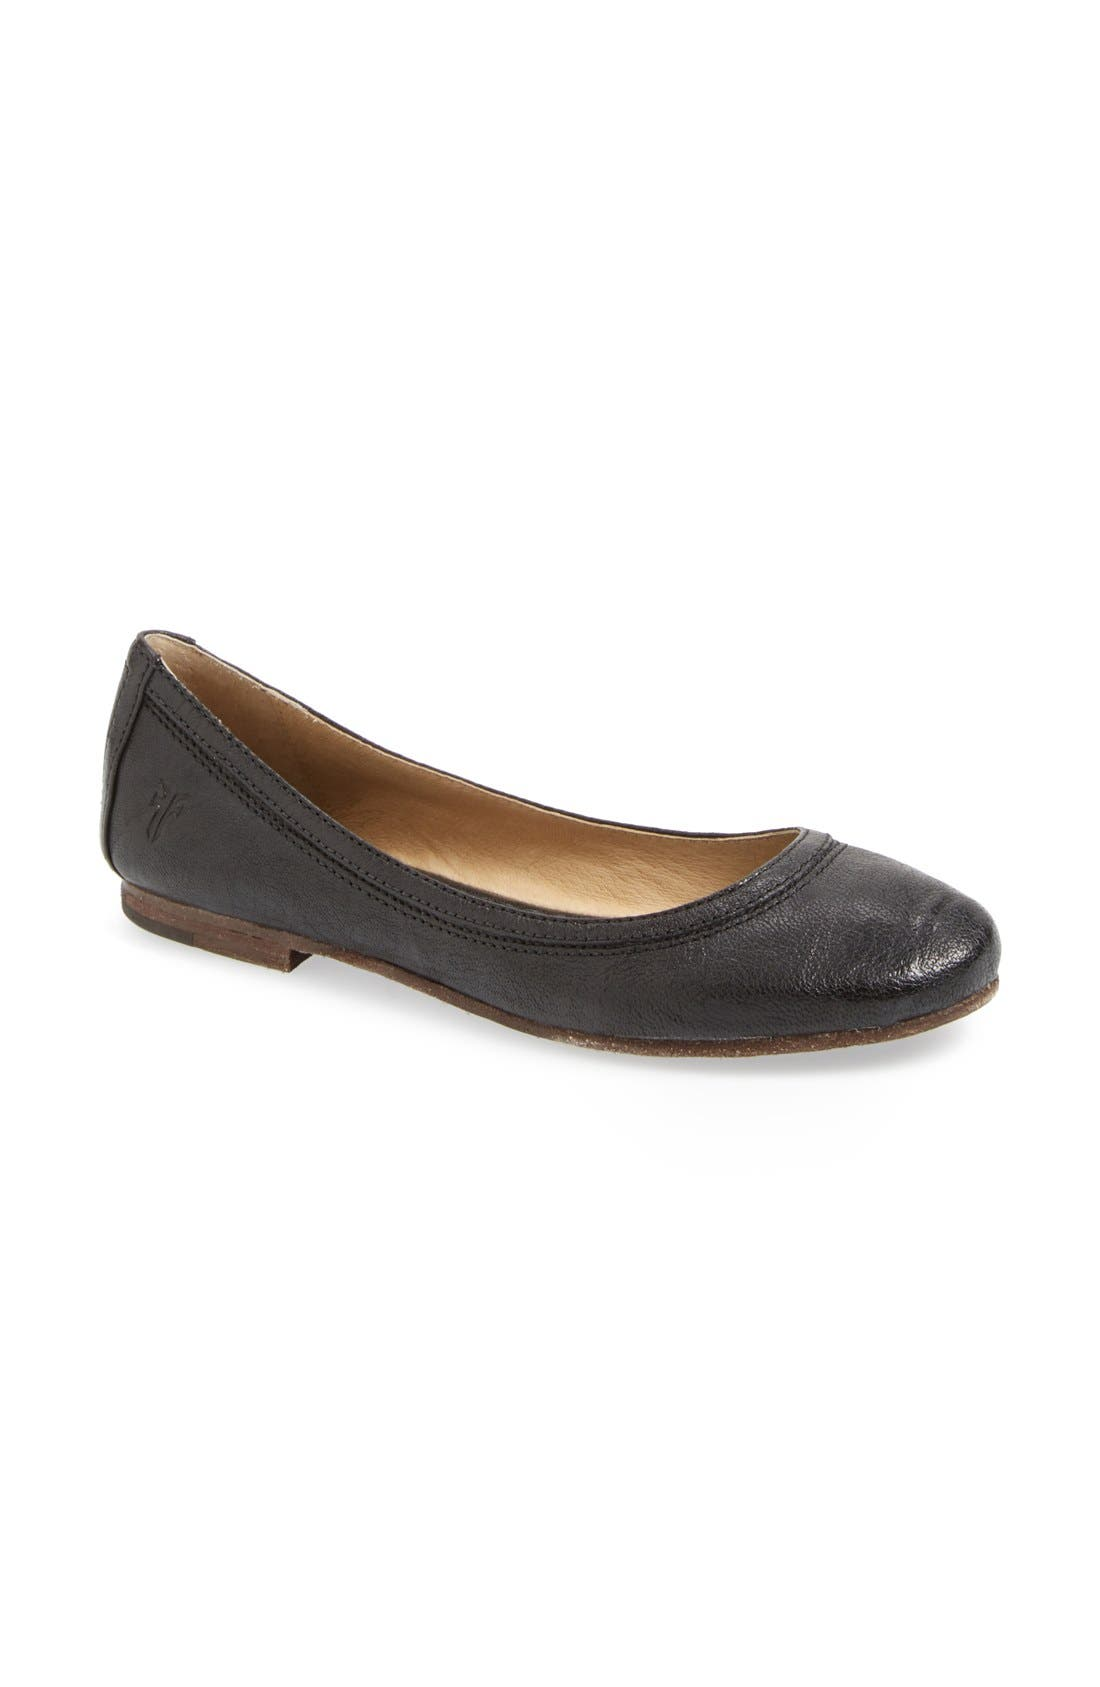 'Carson' Ballet Flat,                         Main,                         color, Black/ Black Leather